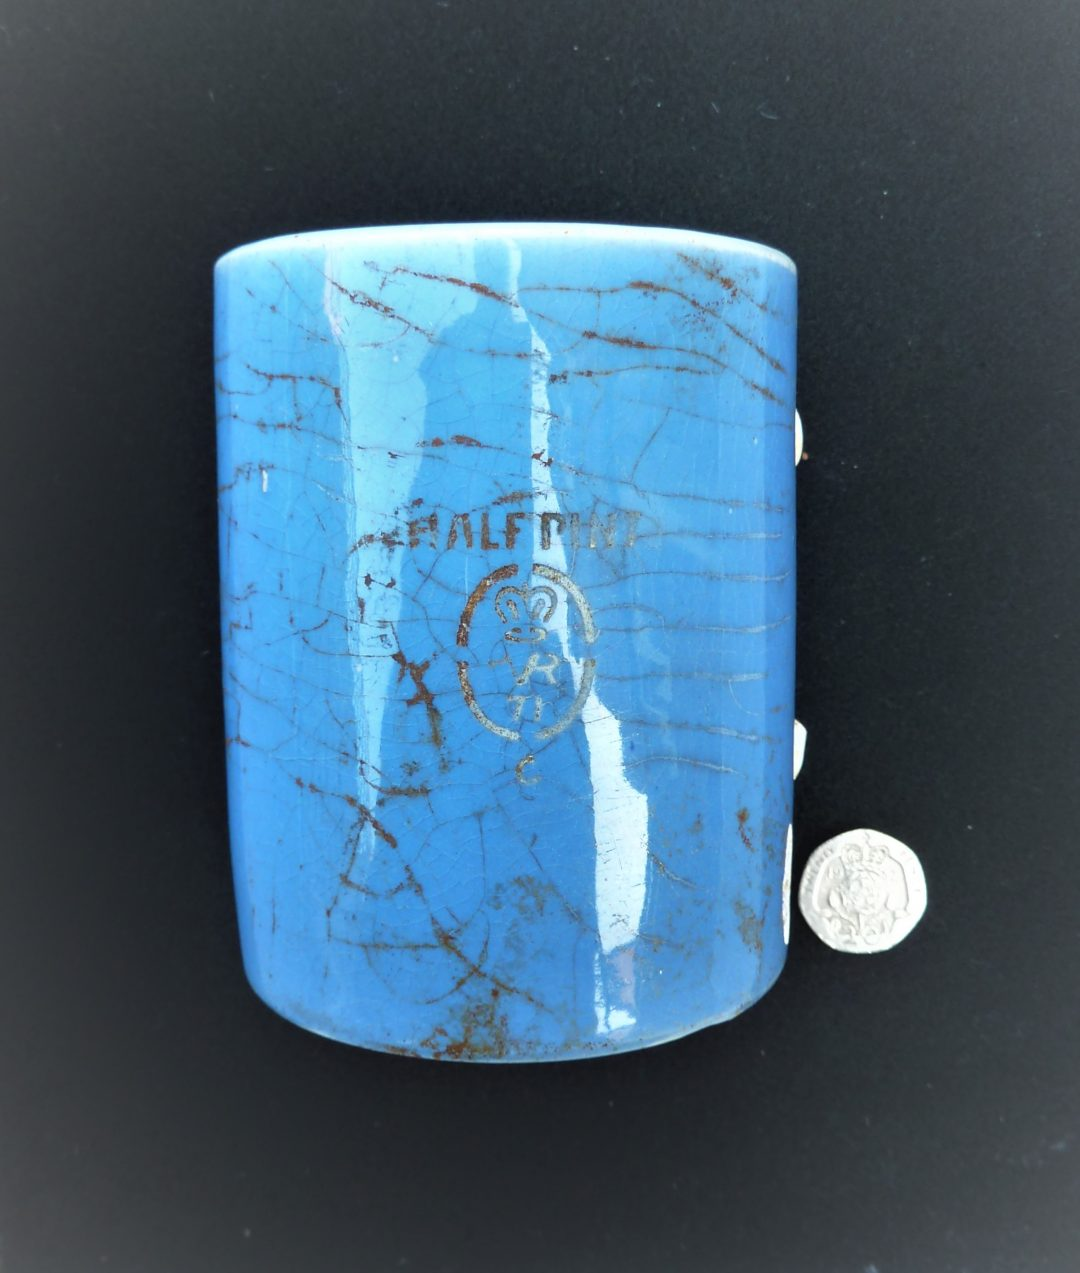 Half-pint pub mug